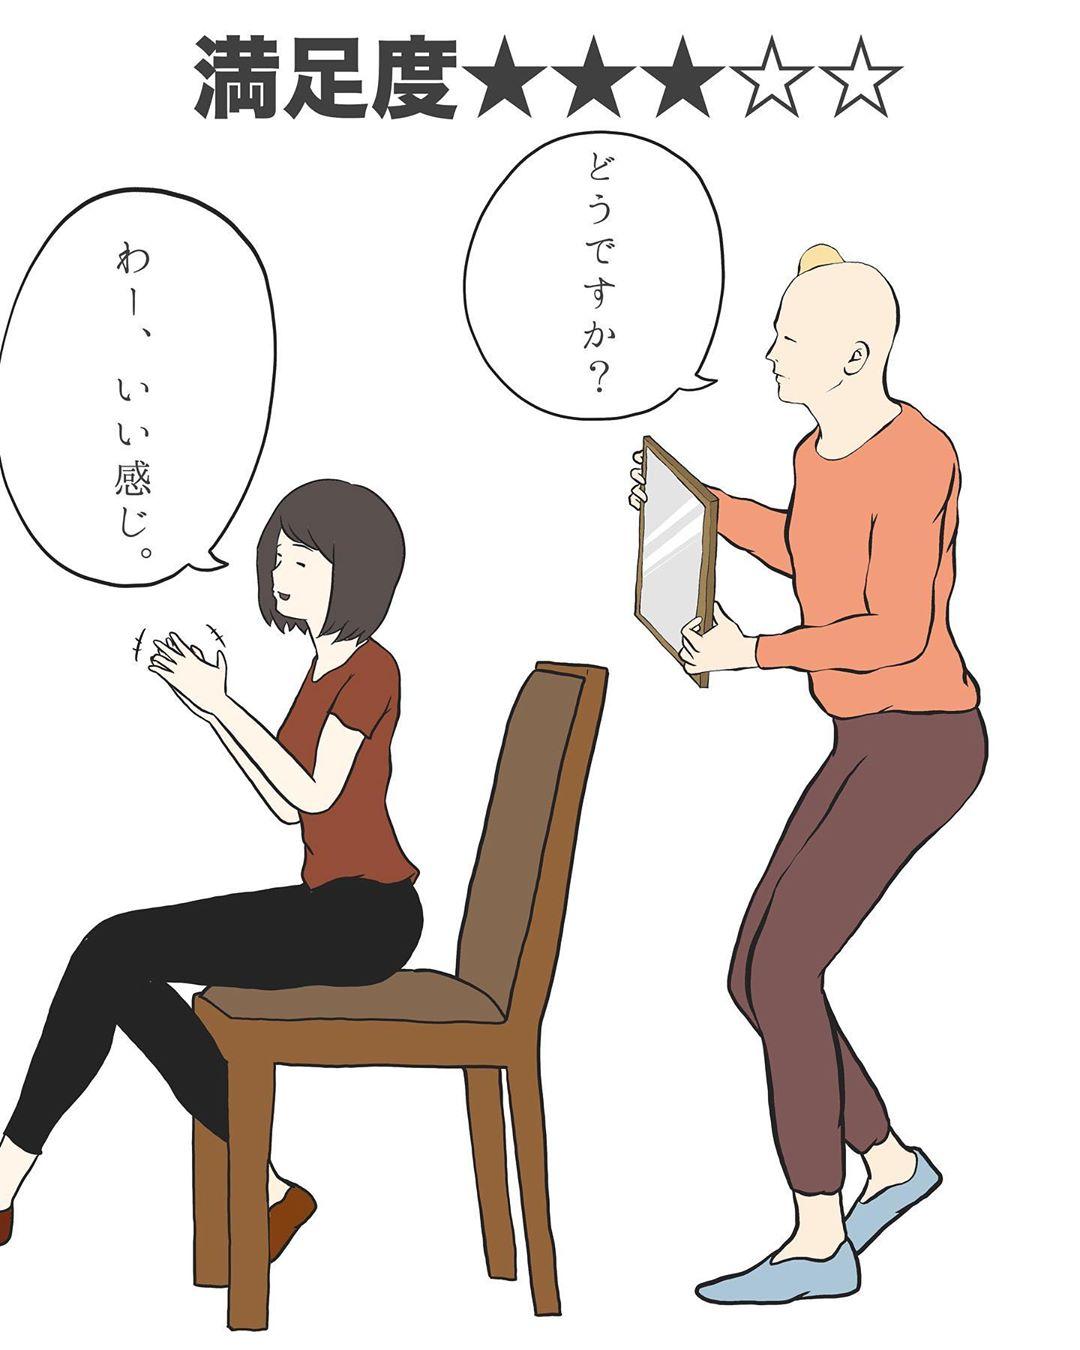 takuo_illustrator_69837161_690598964791883_7775549835210493768_n